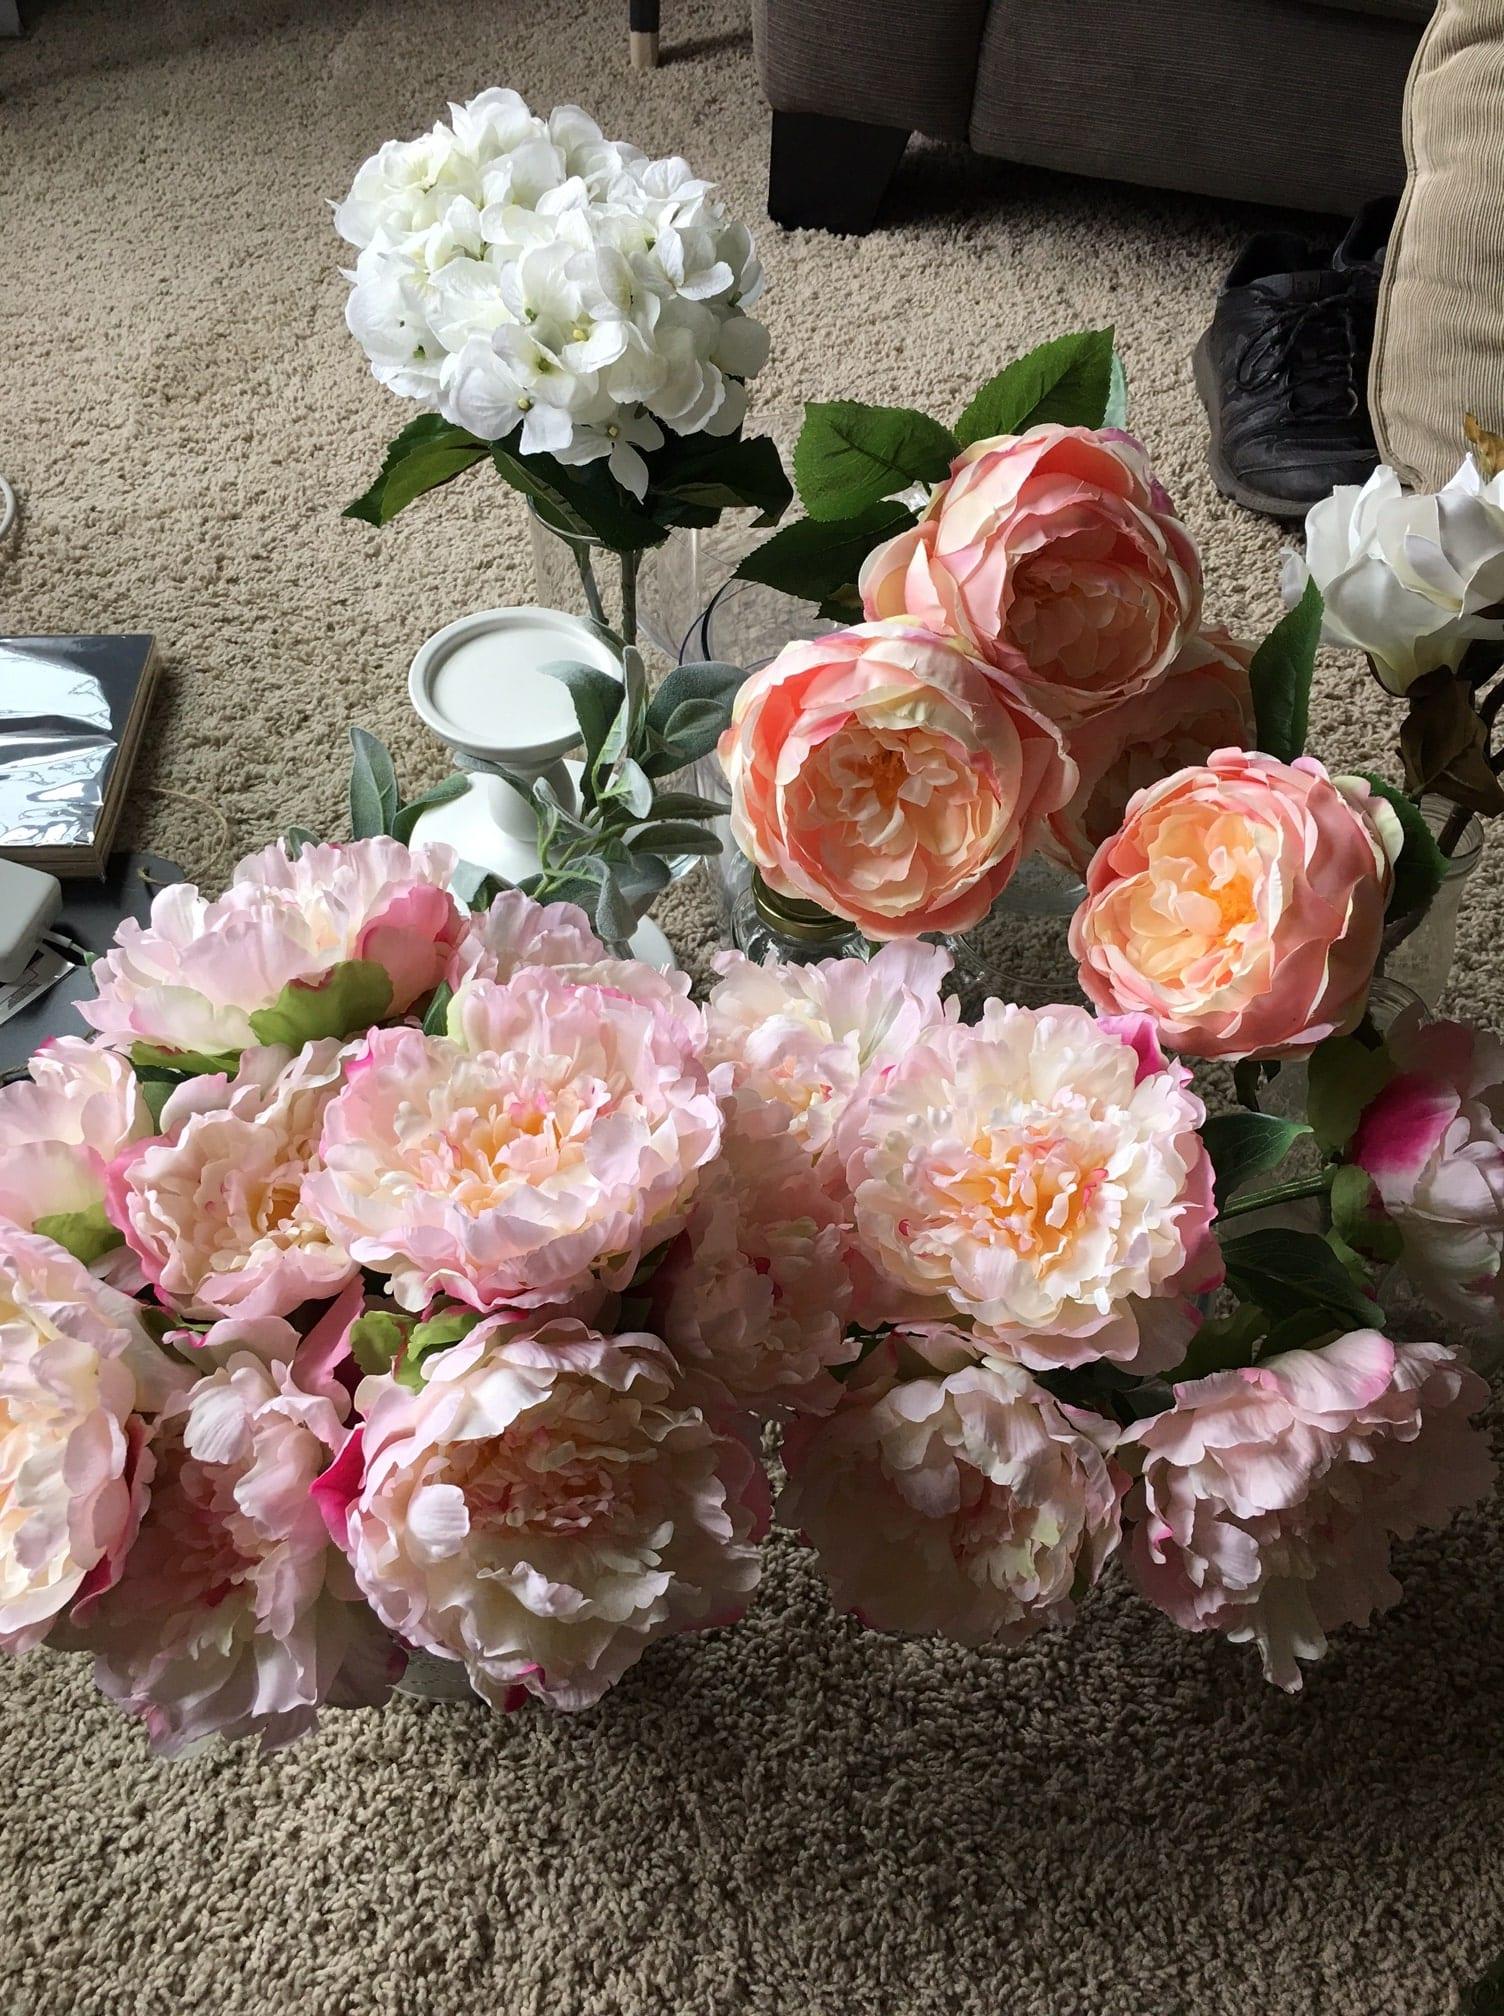 DIY-Fake-Flower-Bouquet-7-min - Angie Away